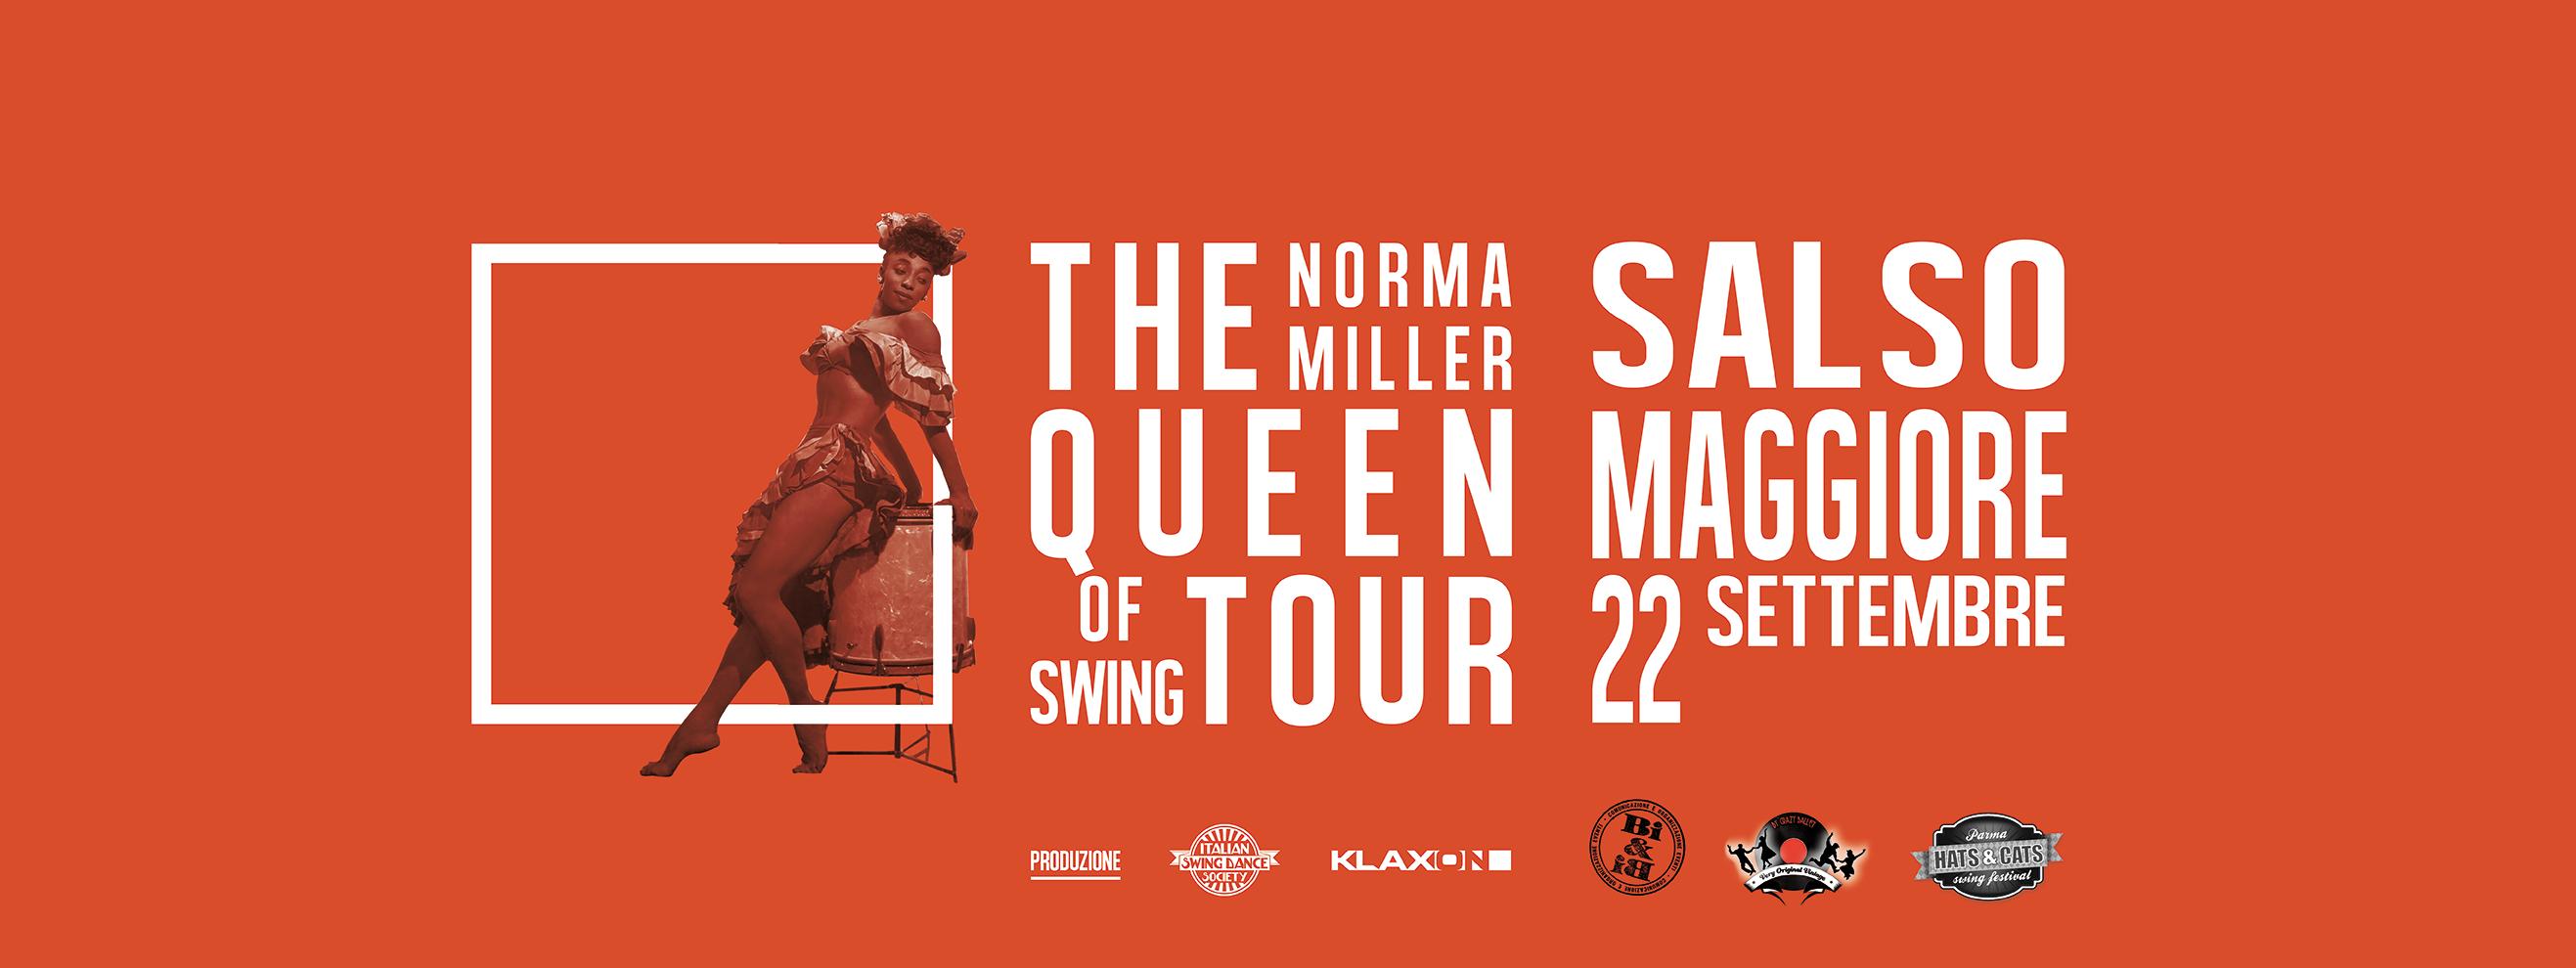 norma-miller-tour_salso-web